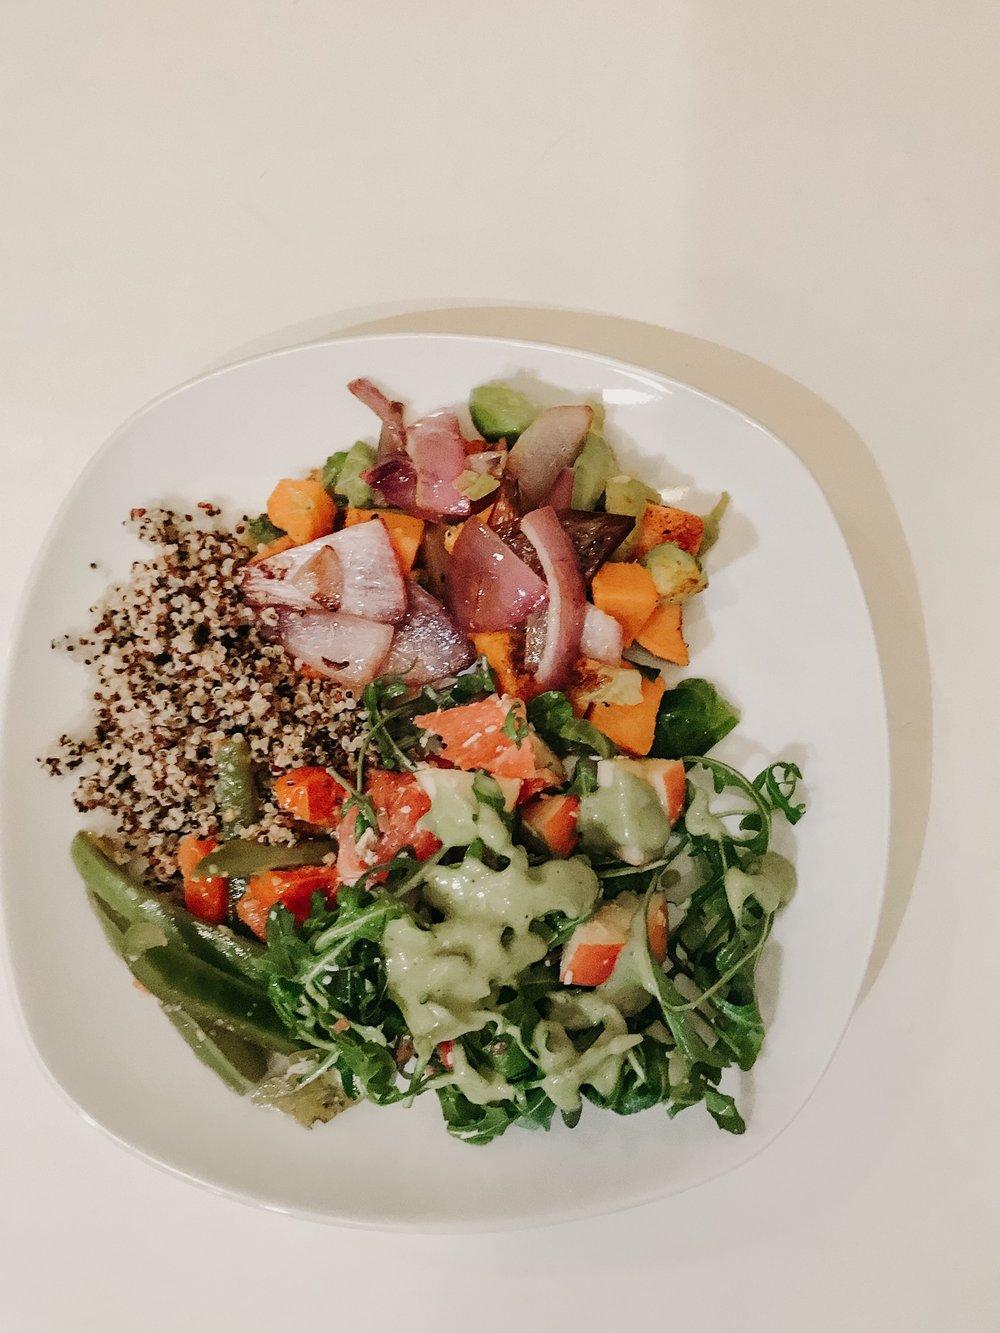 arugula salad & quinoa - + arugula + avocado dressing+ grilled veggies (I did red onion, sweet potatoes, bell peppers)+ quinoa + apples + grapefruit+ avocado dressing